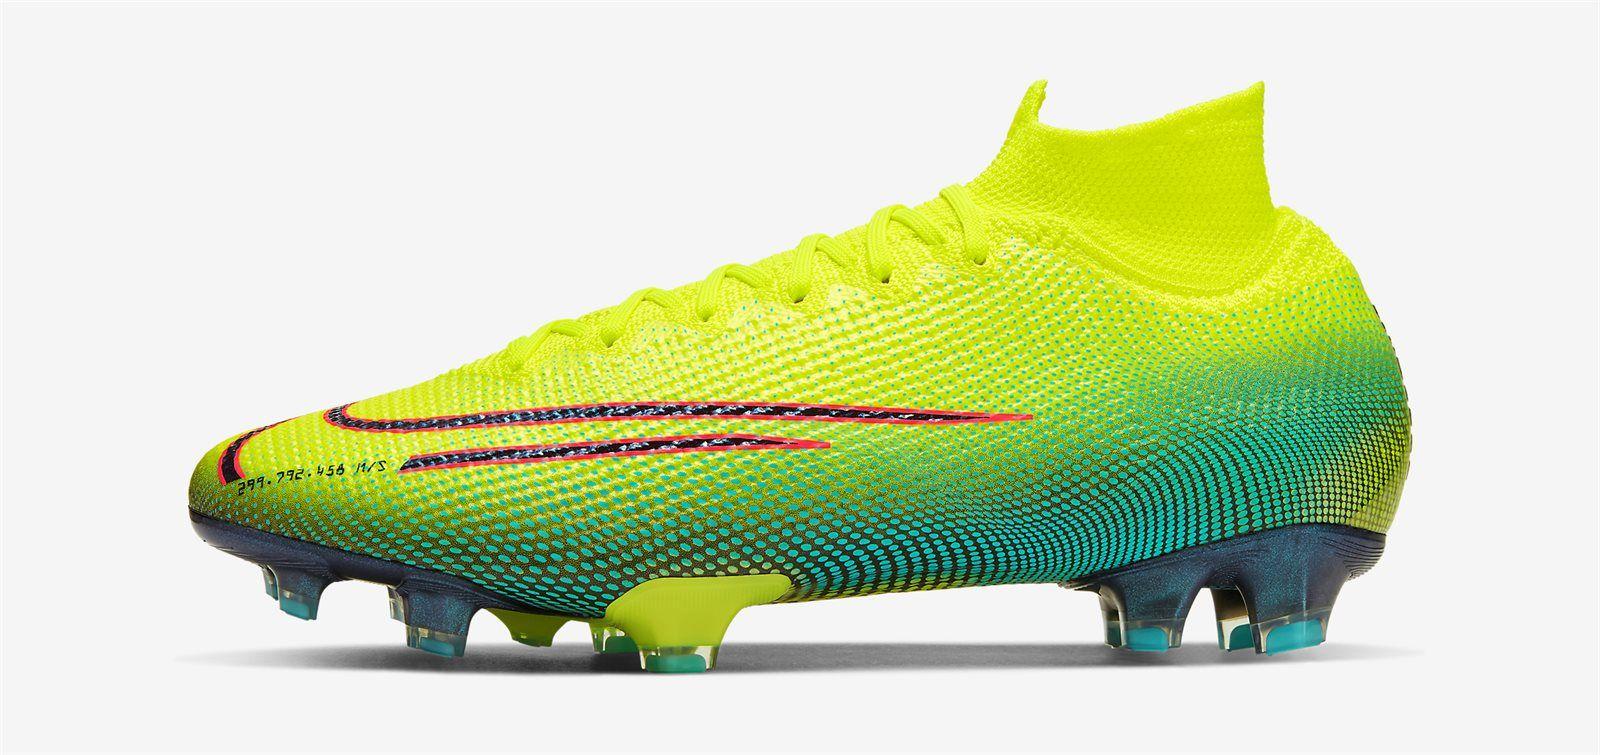 Ronaldo New Football Boots 2020 Di 2020